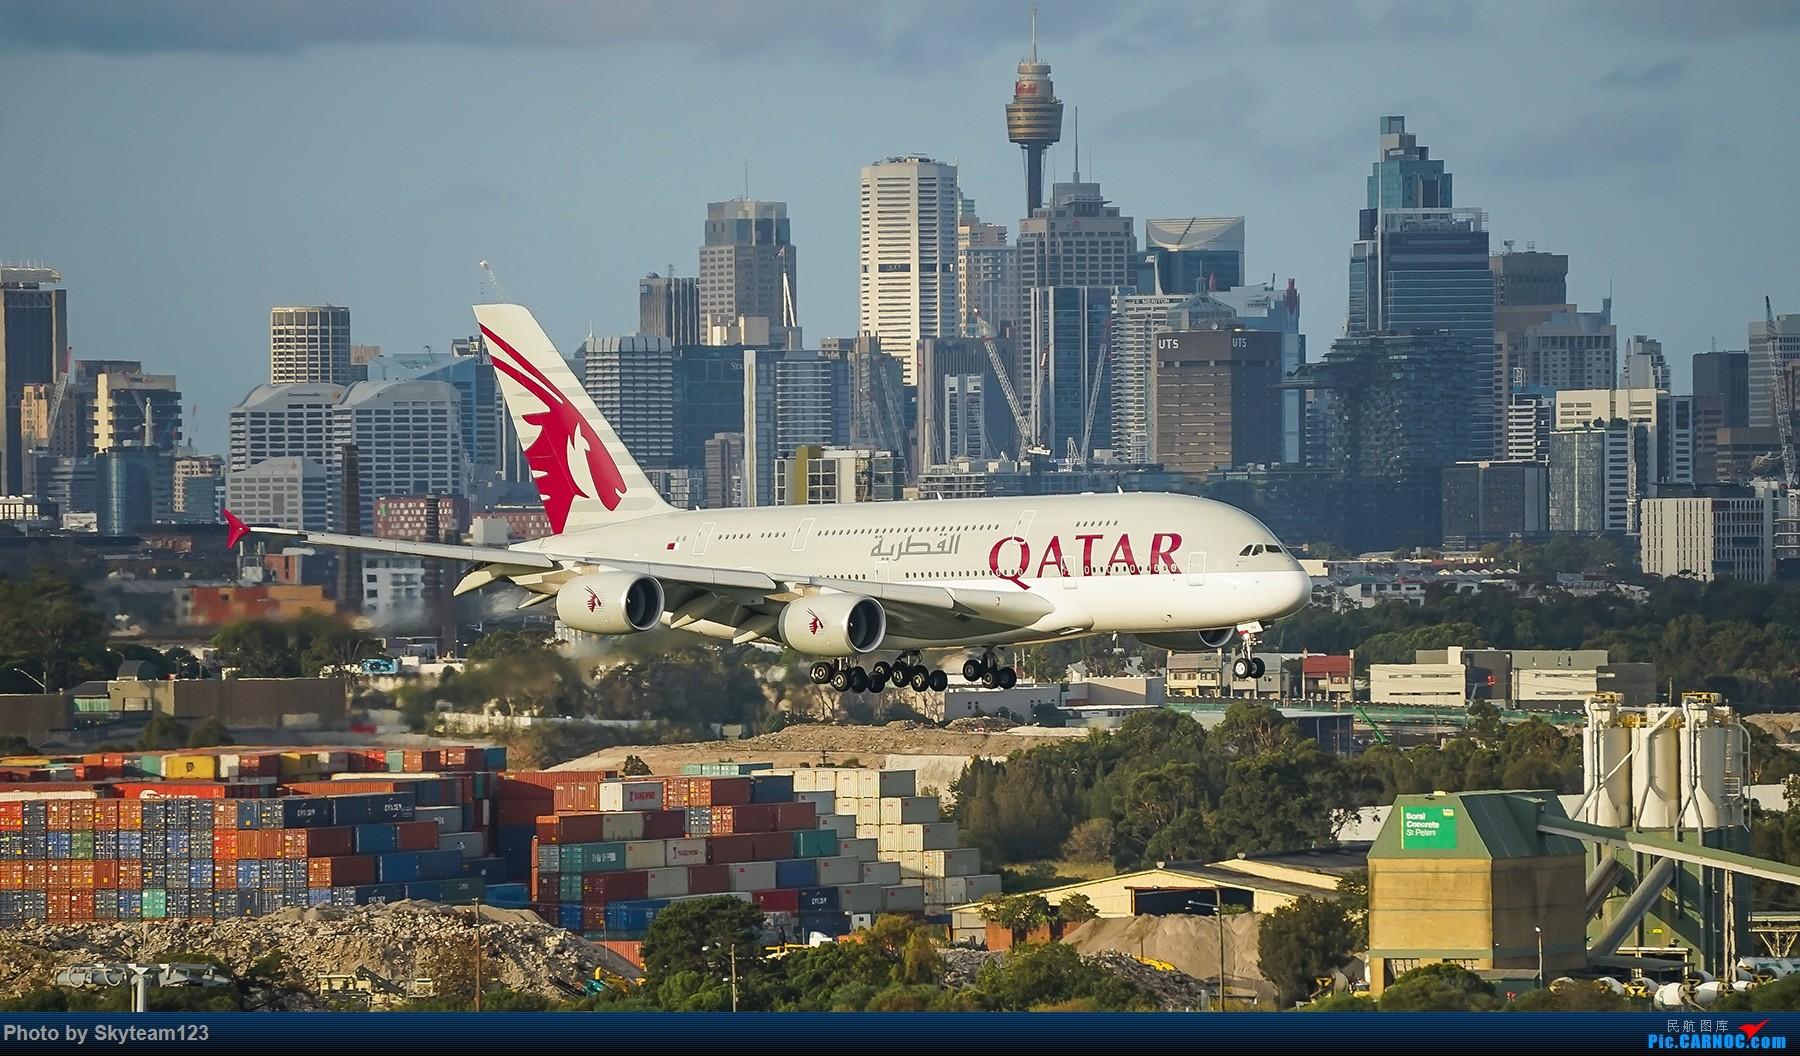 Re:[原创]【SYD】解锁T1国际航站旁停车场顶楼拍机位 下午16R抵达的好货们以及夜拍轨迹 AIRBUS A380-800 A7-APA